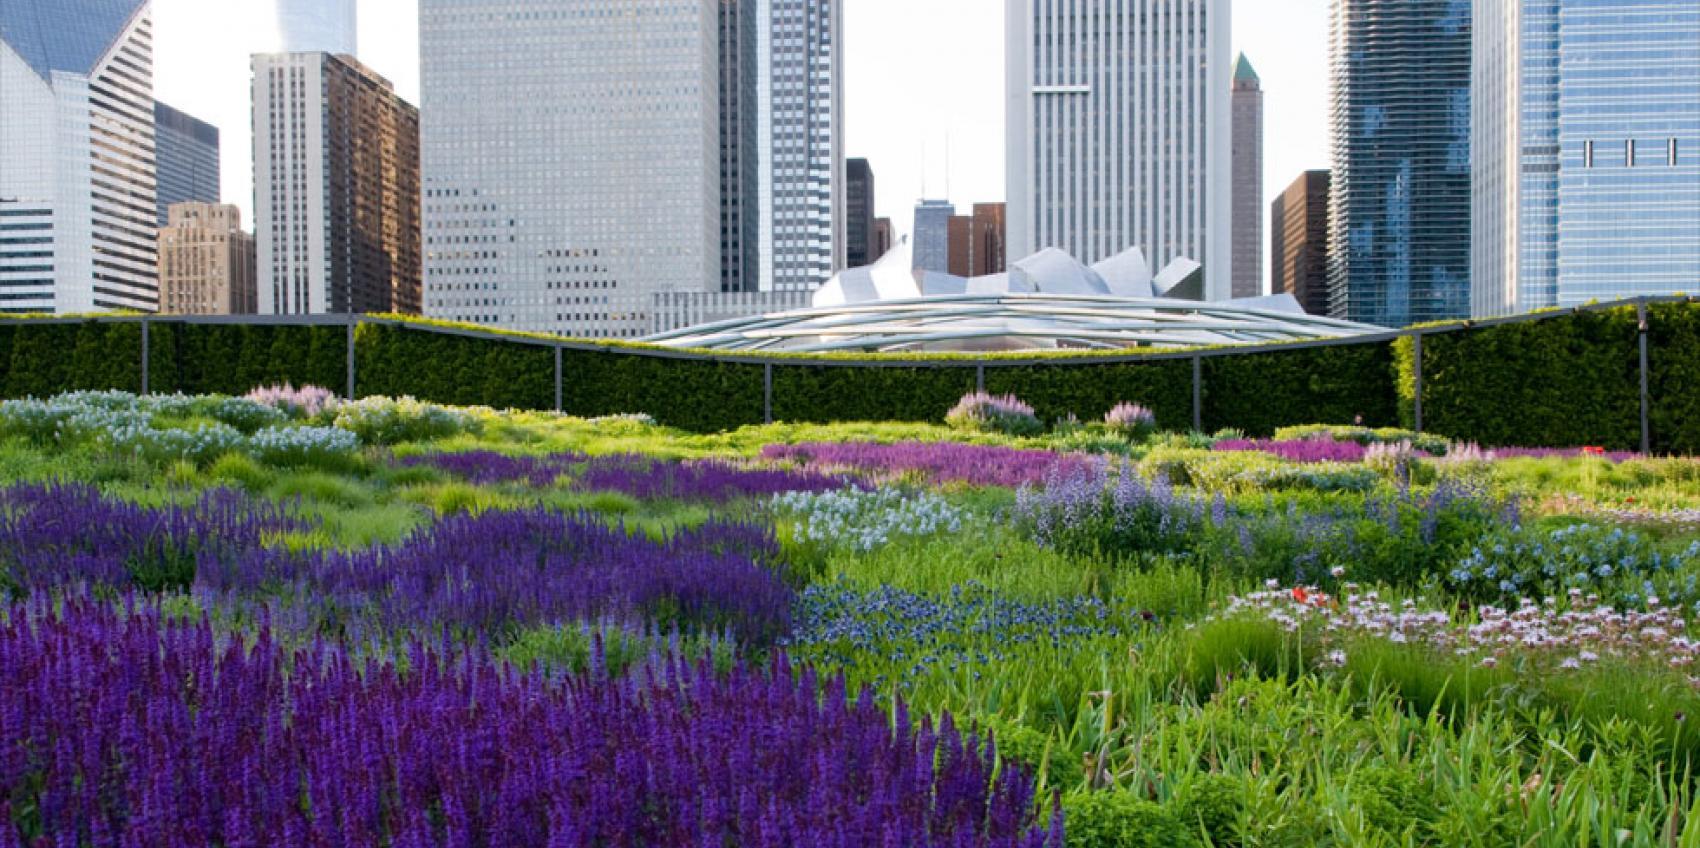 Lurie Garden American Public Gardens Association